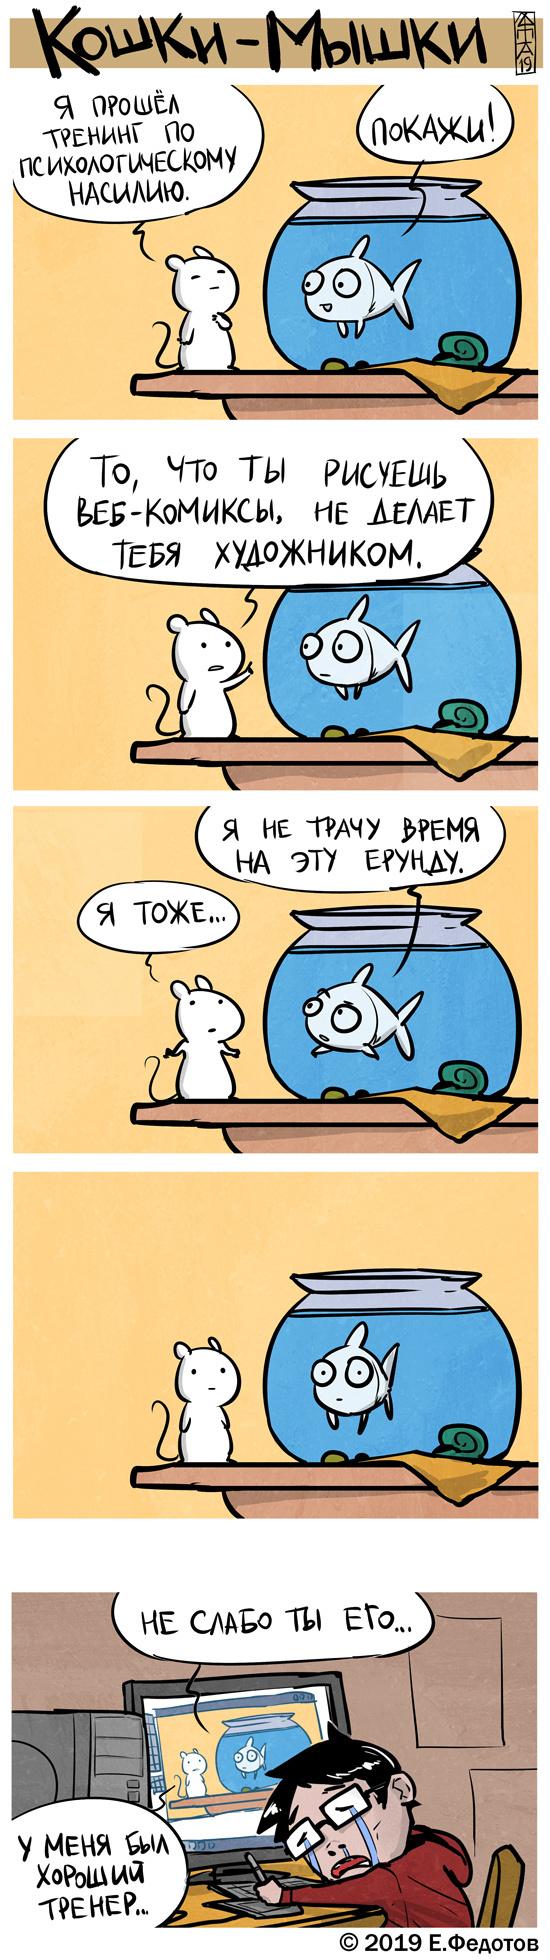 Хороший тренинг Кошки-Мышки, Комиксы, Кот, Тренинг, Длиннопост